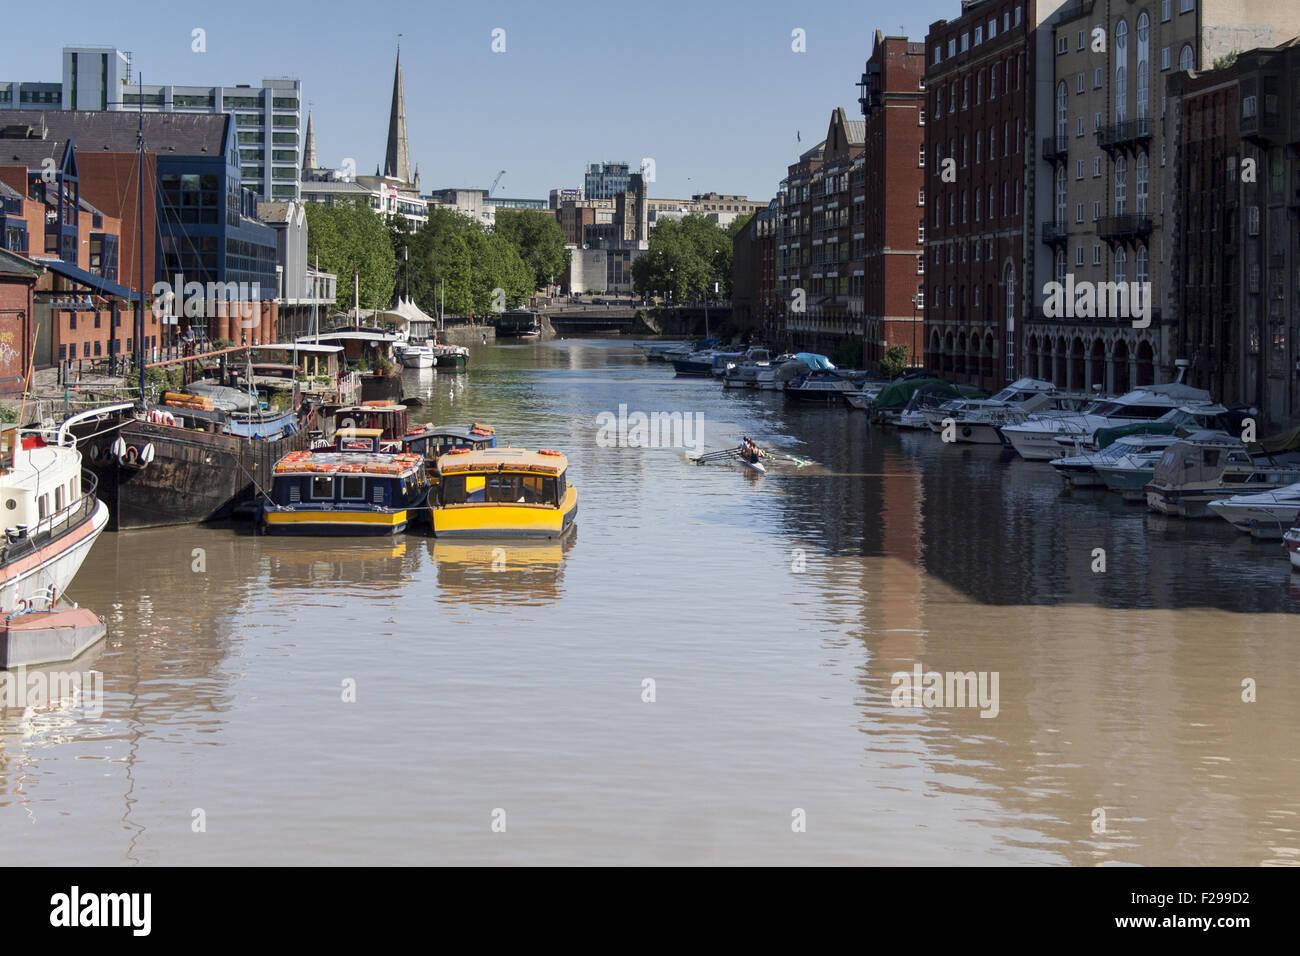 View of Bristol docks looking towards Bristol Bridge showing riverside warehouses - Stock Image